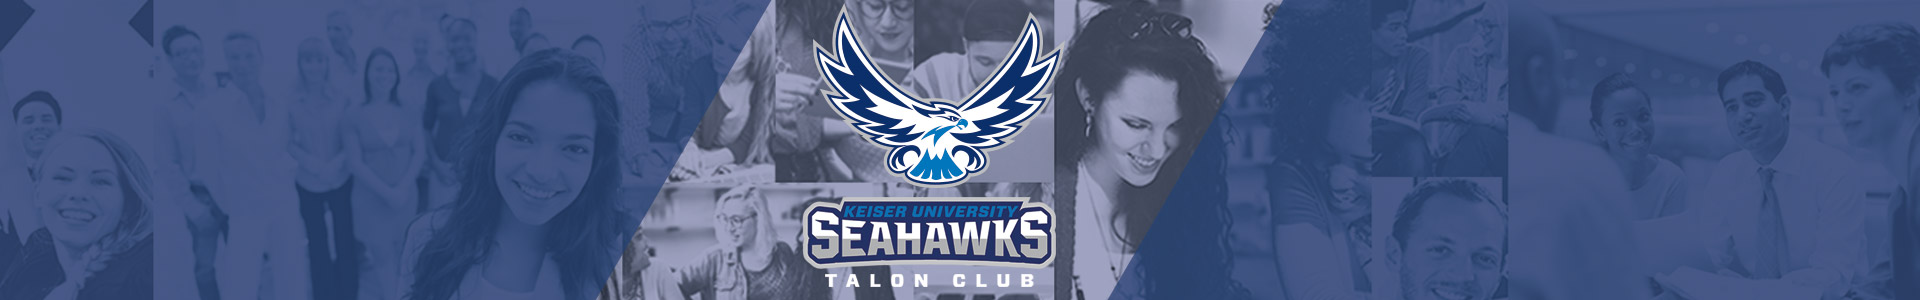 Keiser University Alumni | Talon Club